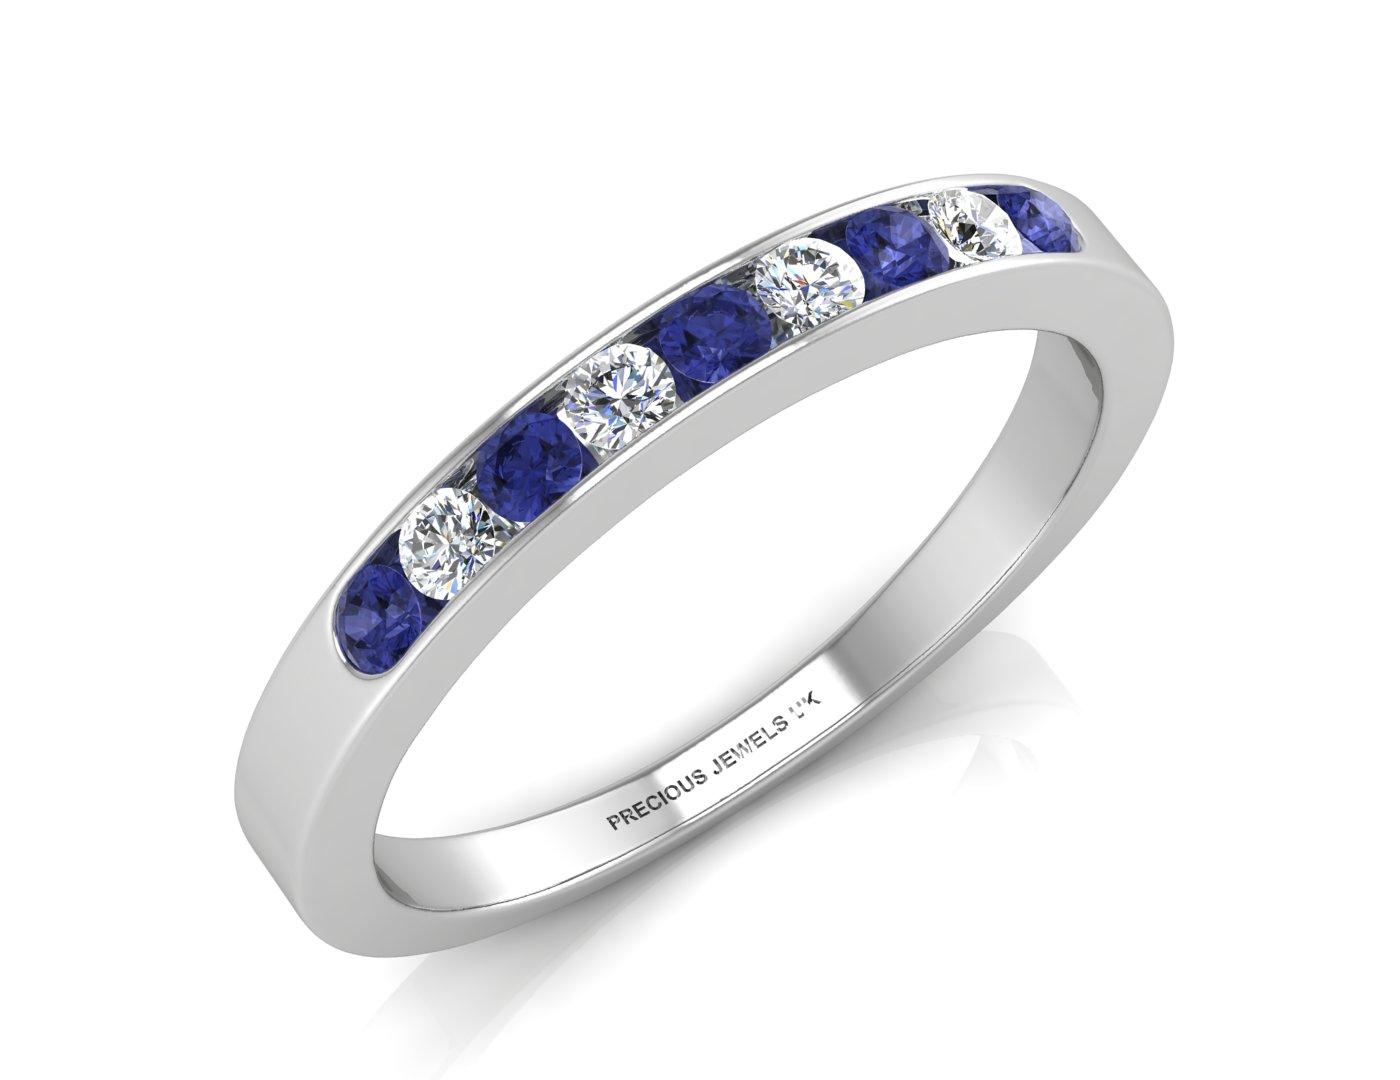 Lot 55 - 9ct White Gold Channel Set Semi Eternity Diamond & Sapphire Ring